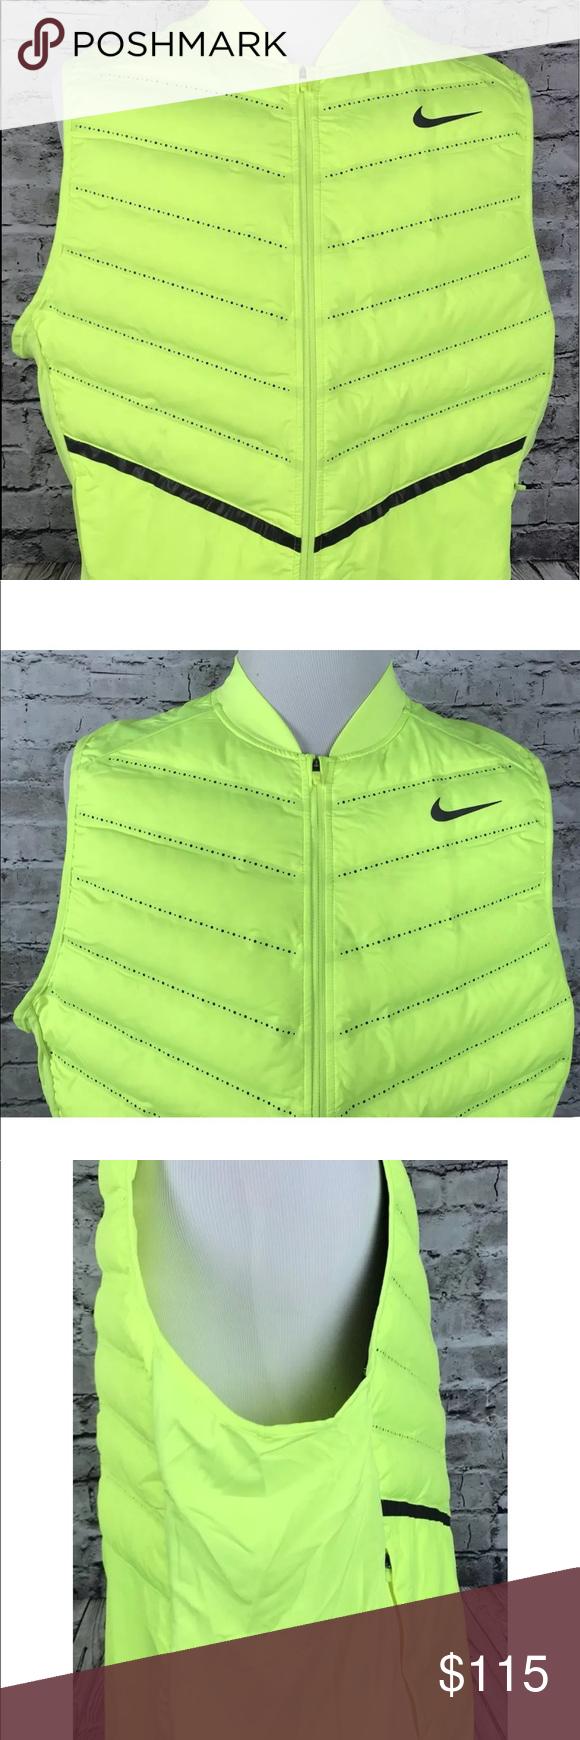 a72231db5877 Nike Aeroloft Down Packable Running Vest Sz XXL Nike Aeroloft 800 Running  Vest Volt New Men s Down 800497 702 Size 2XL. P5 Nike Jackets   Coats Vests